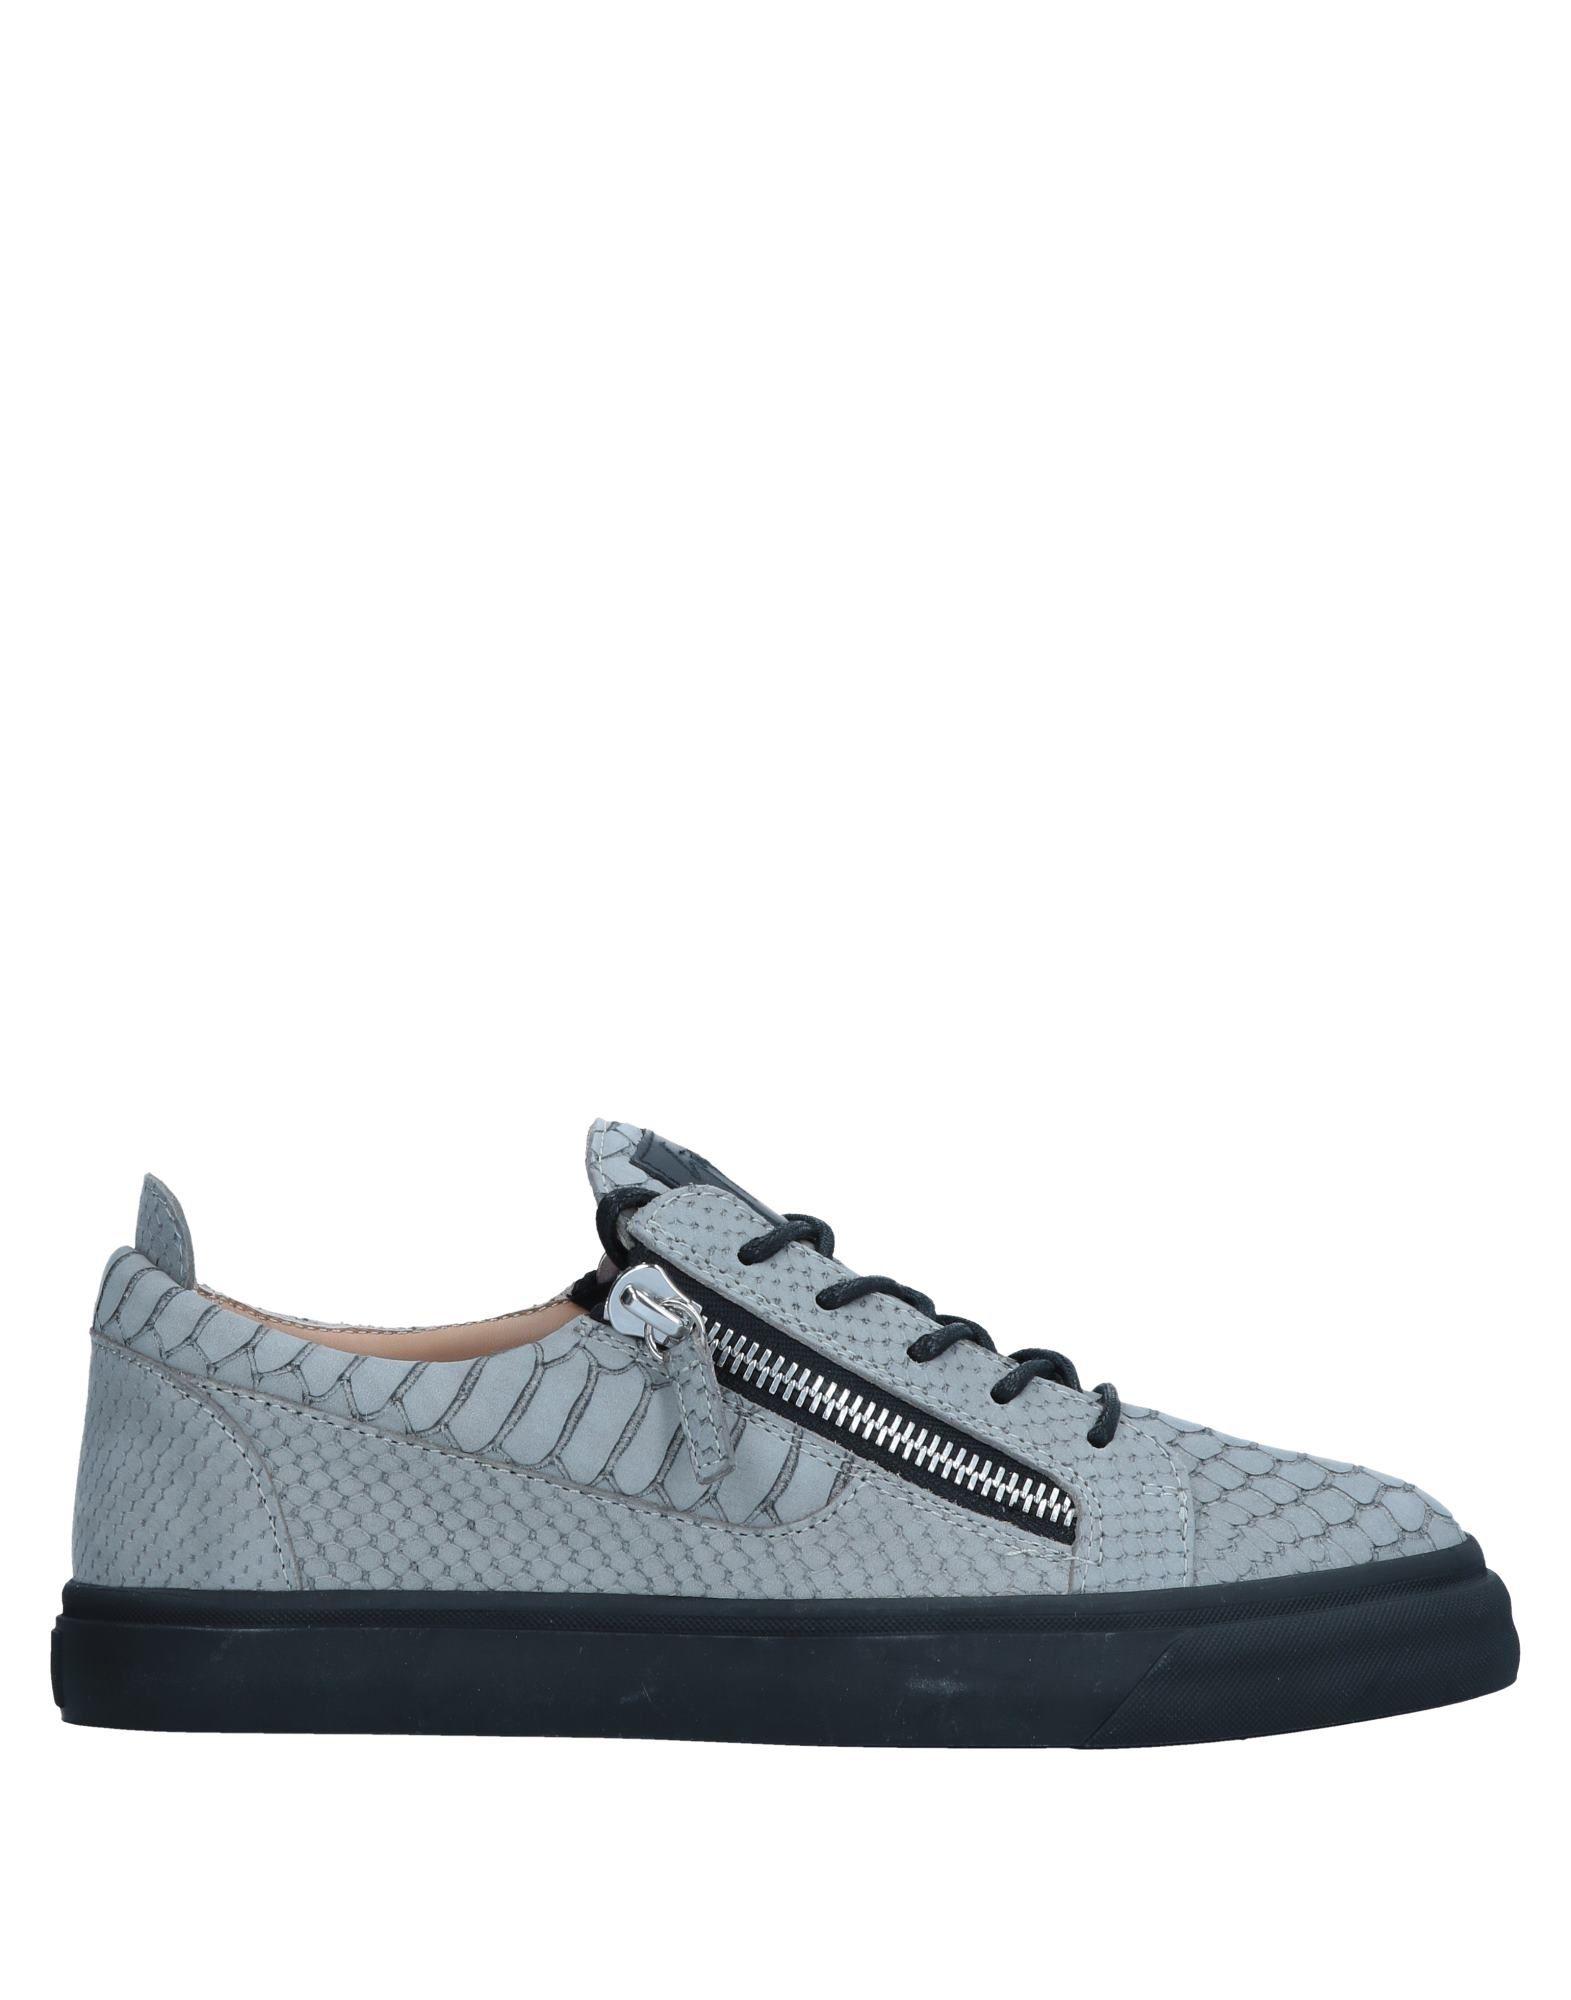 Sneakers Giuseppe Zanotti Homme - Sneakers Giuseppe Zanotti  Gris Spécial temps limité